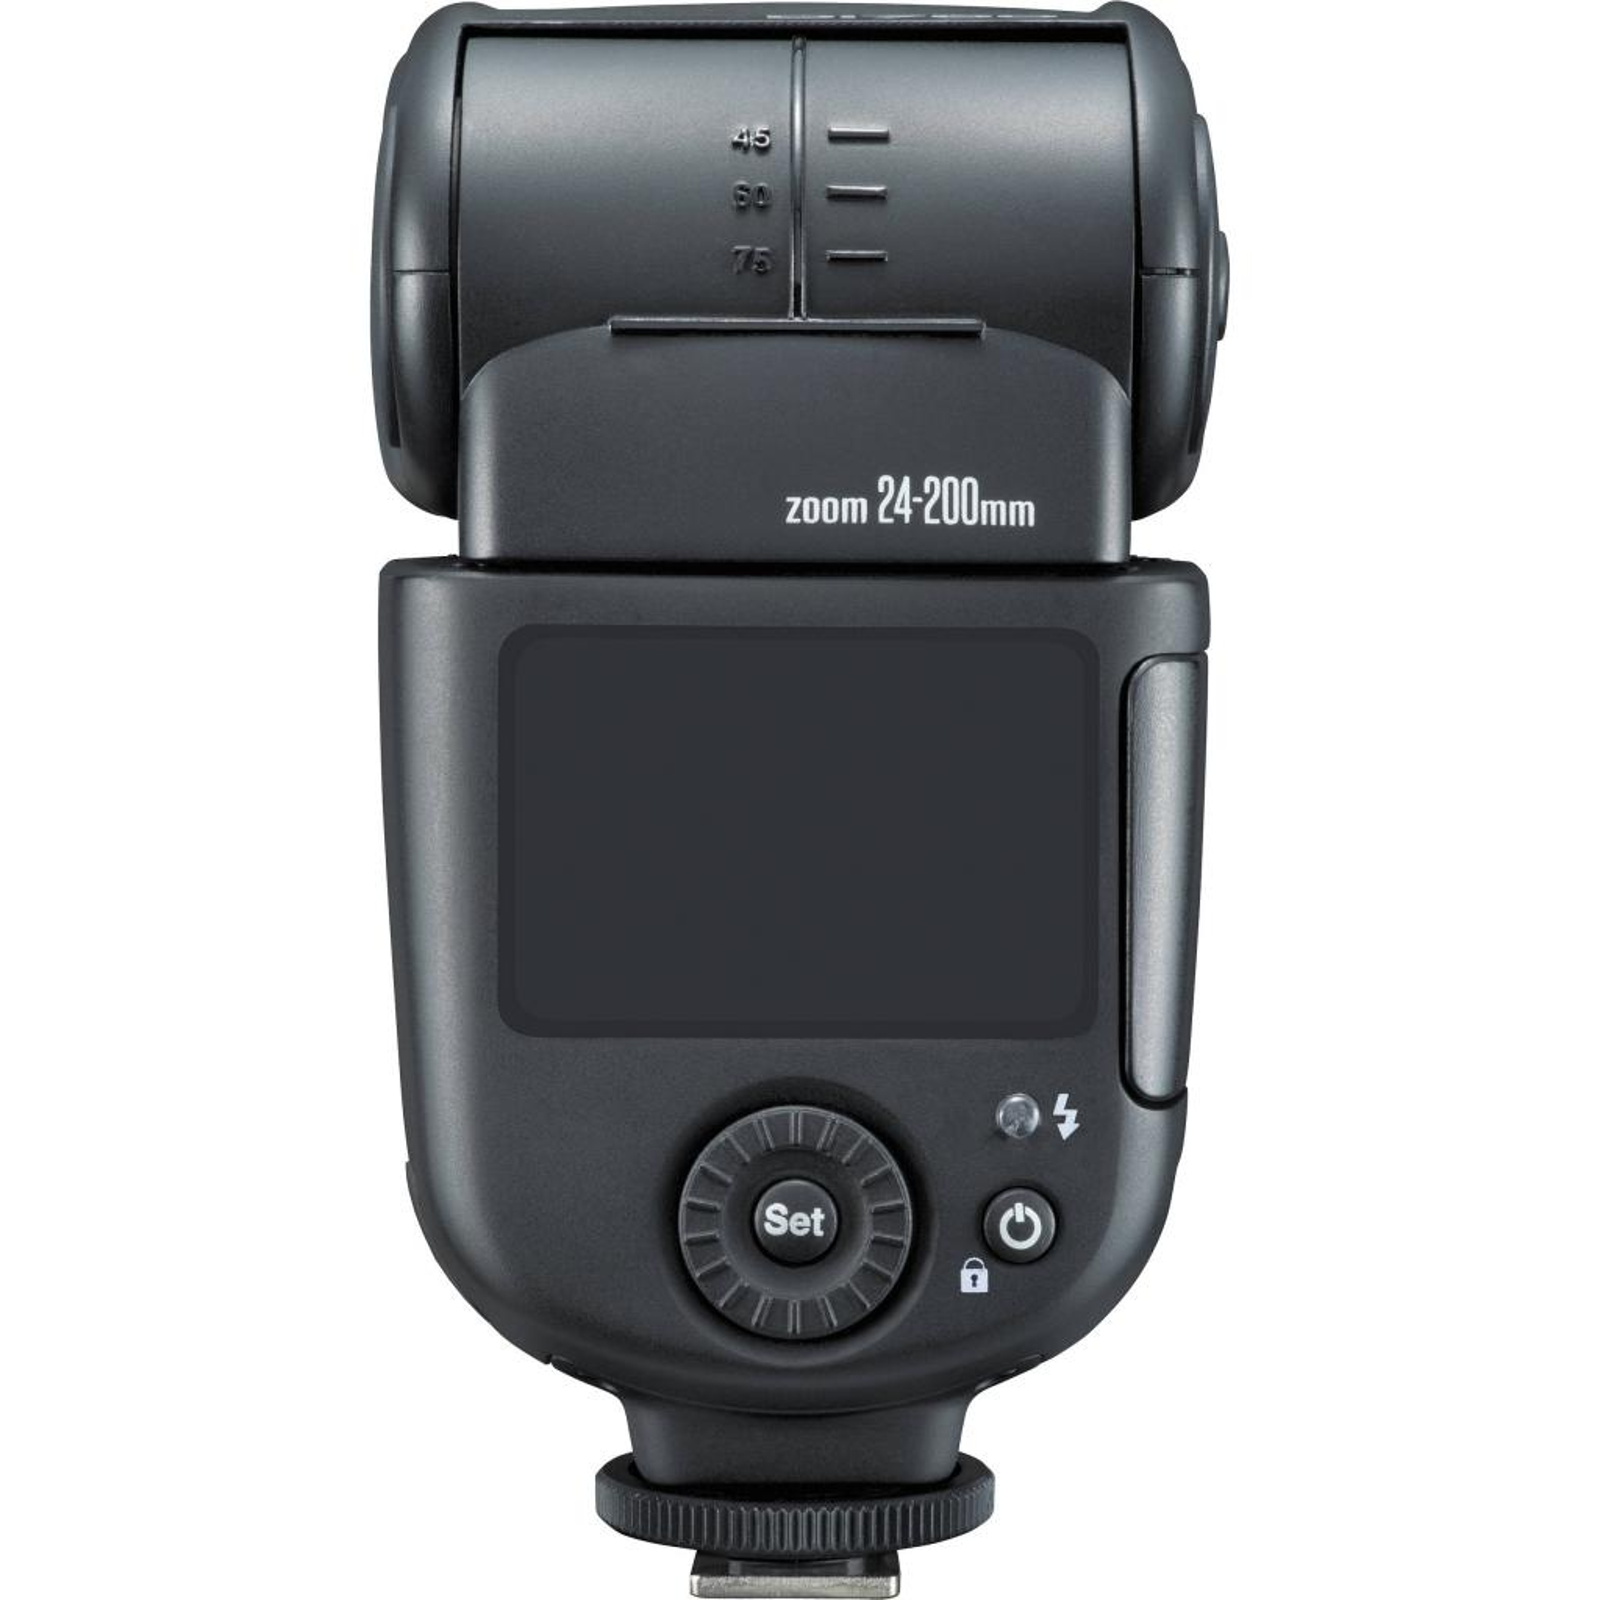 Вспышка Nissin Speedlite Di700A Kit Nikon (N087) изображение 3